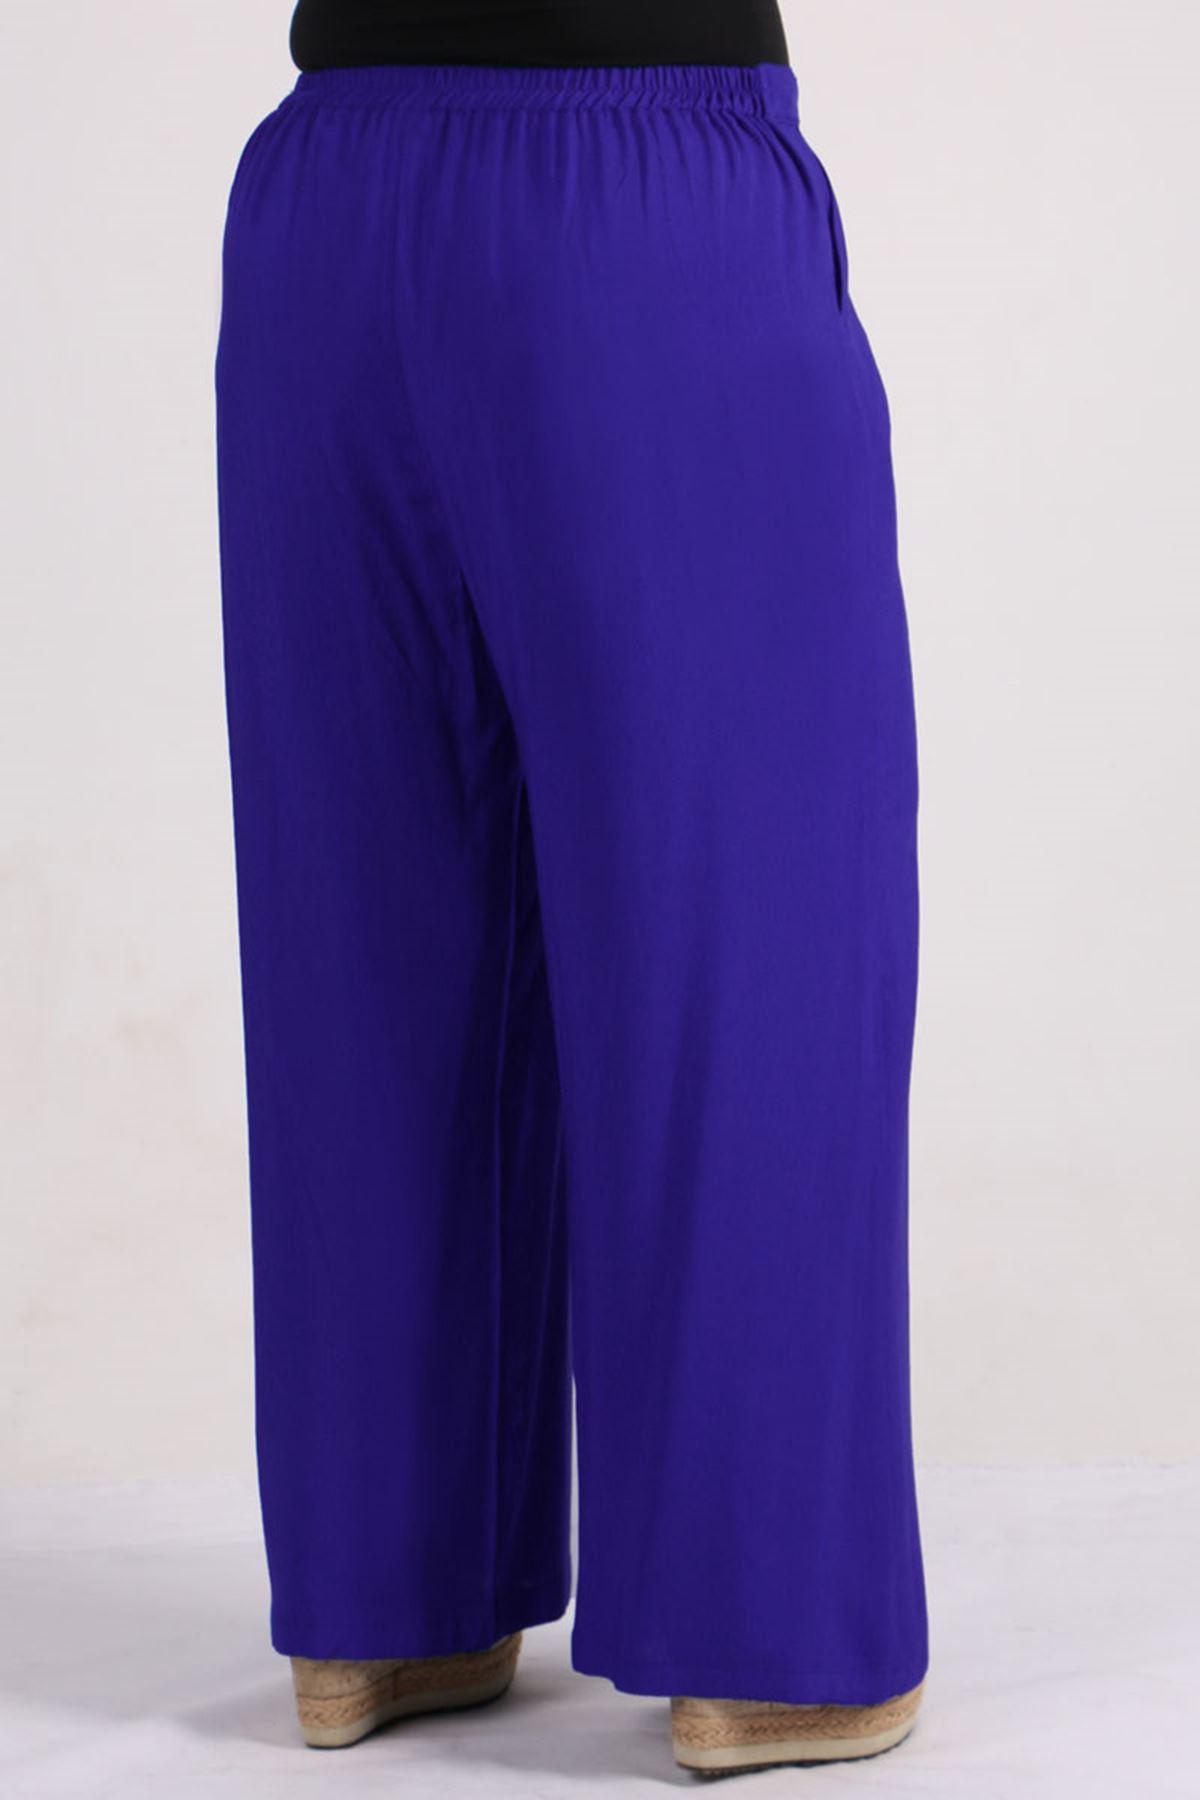 9156 Plus Size Pants - Saxe